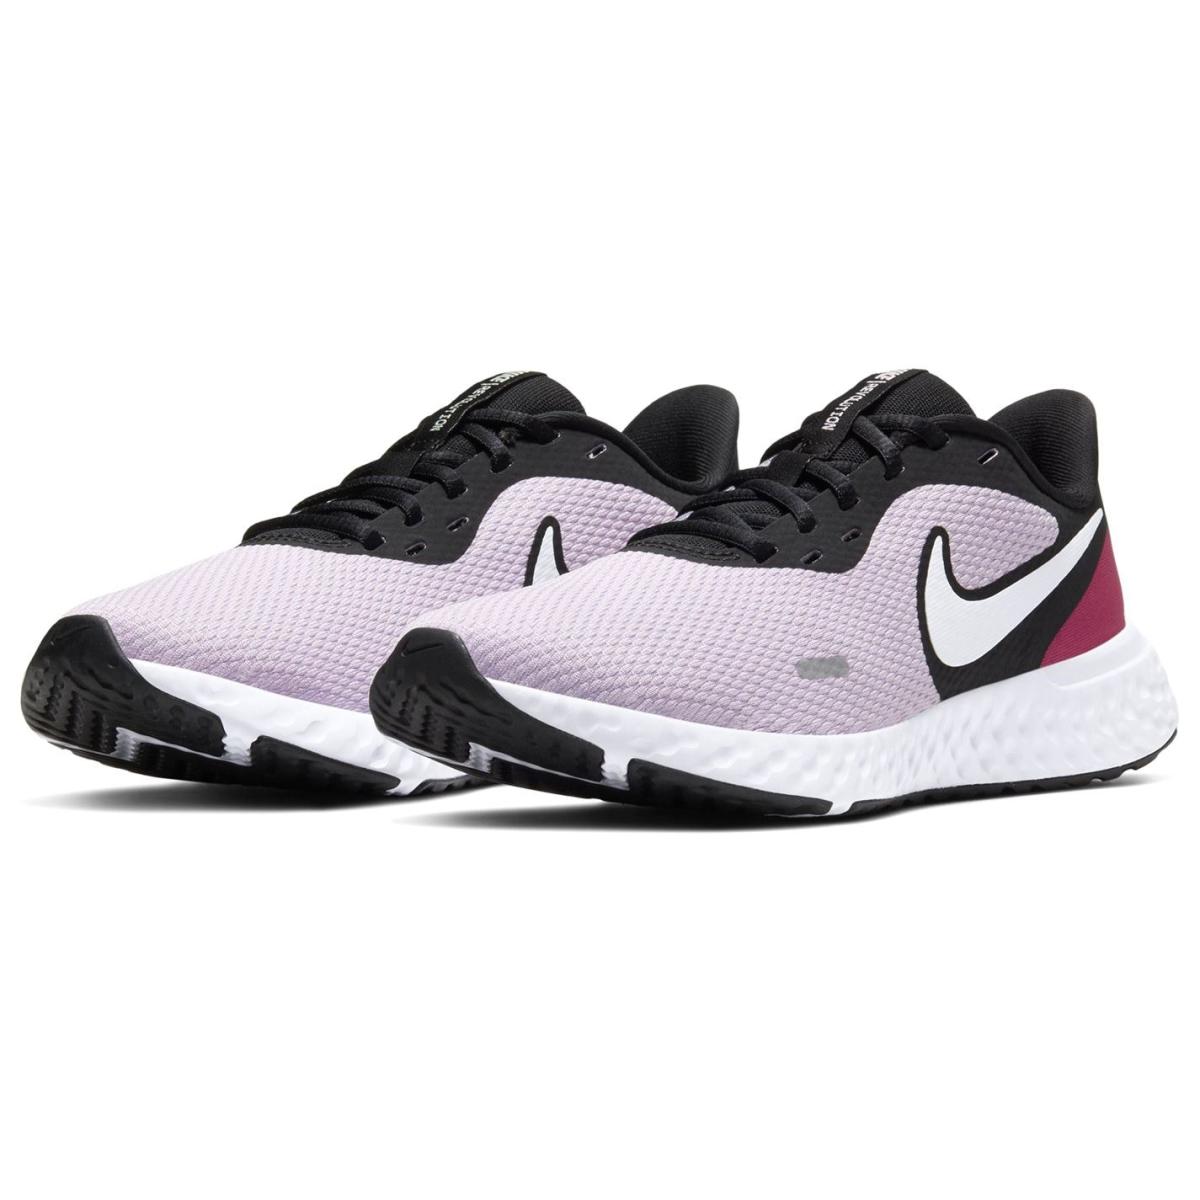 Nike-Revolution-Turnschuhe-Damen-Sneaker-Sportschuhe-Laufschuhe-1160 Indexbild 37